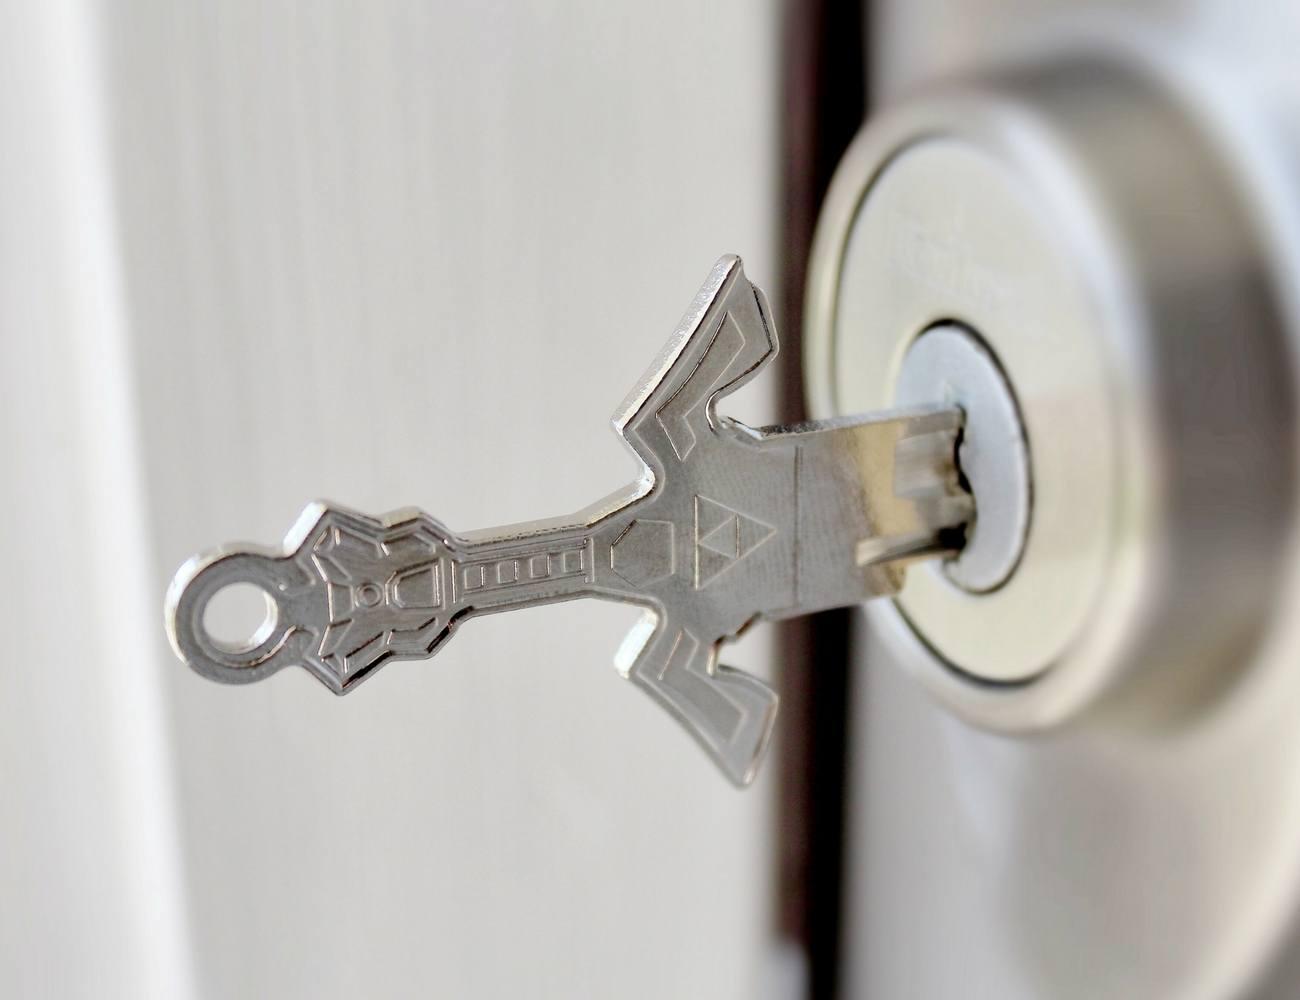 Key+Armory+Sword+Shaped+Keys